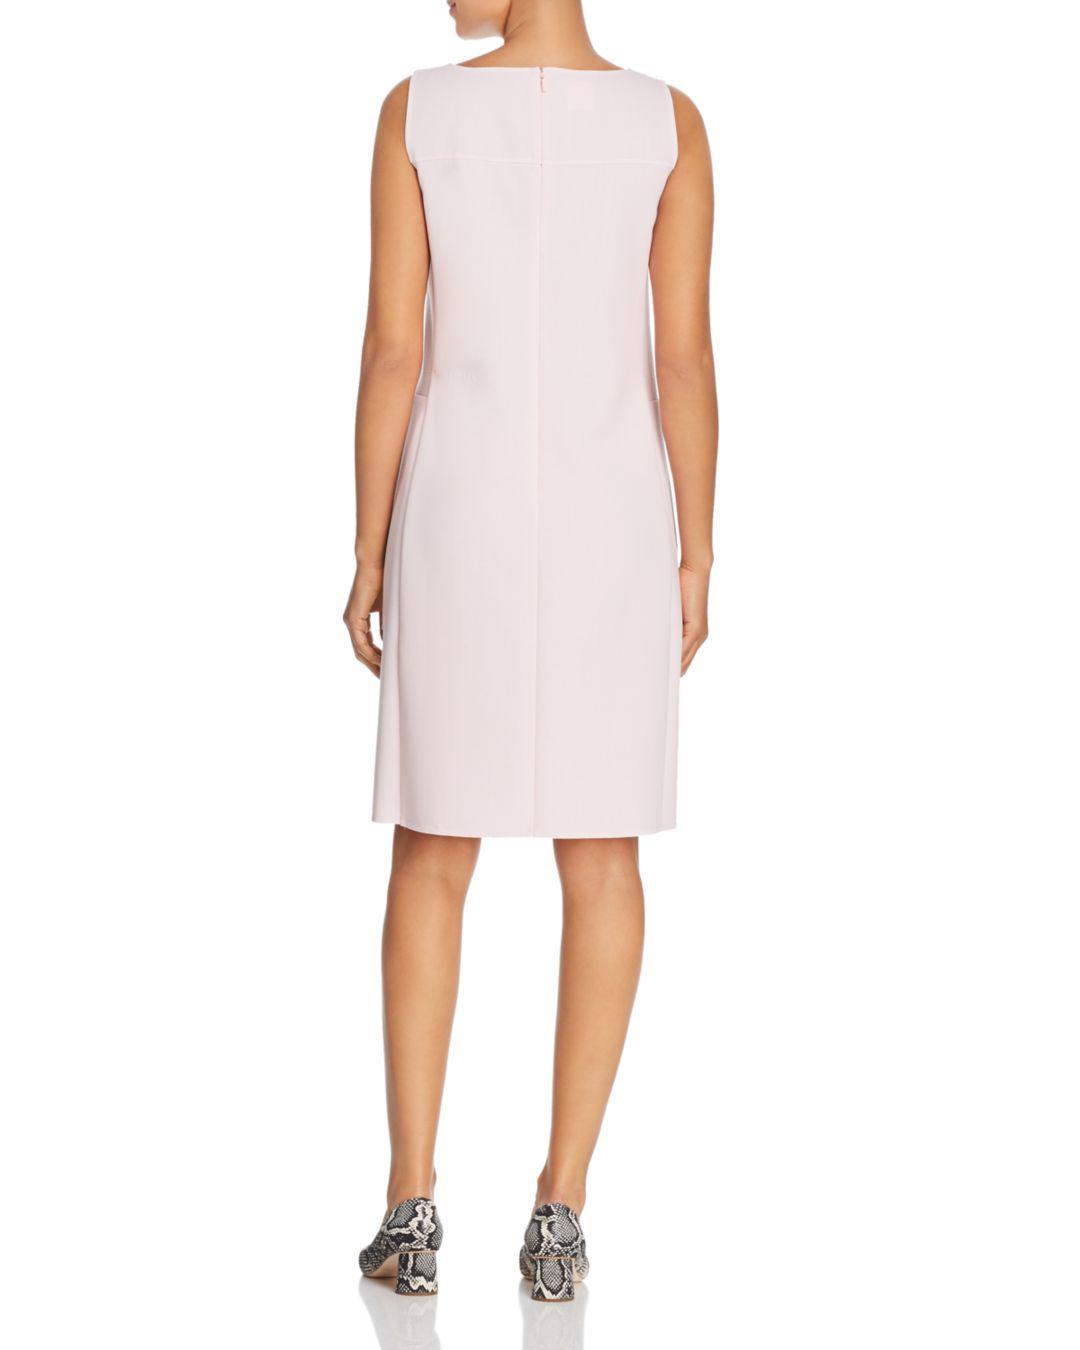 254129a5fcd90 Lyst - Lafayette 148 New York Zayna Dress in Pink